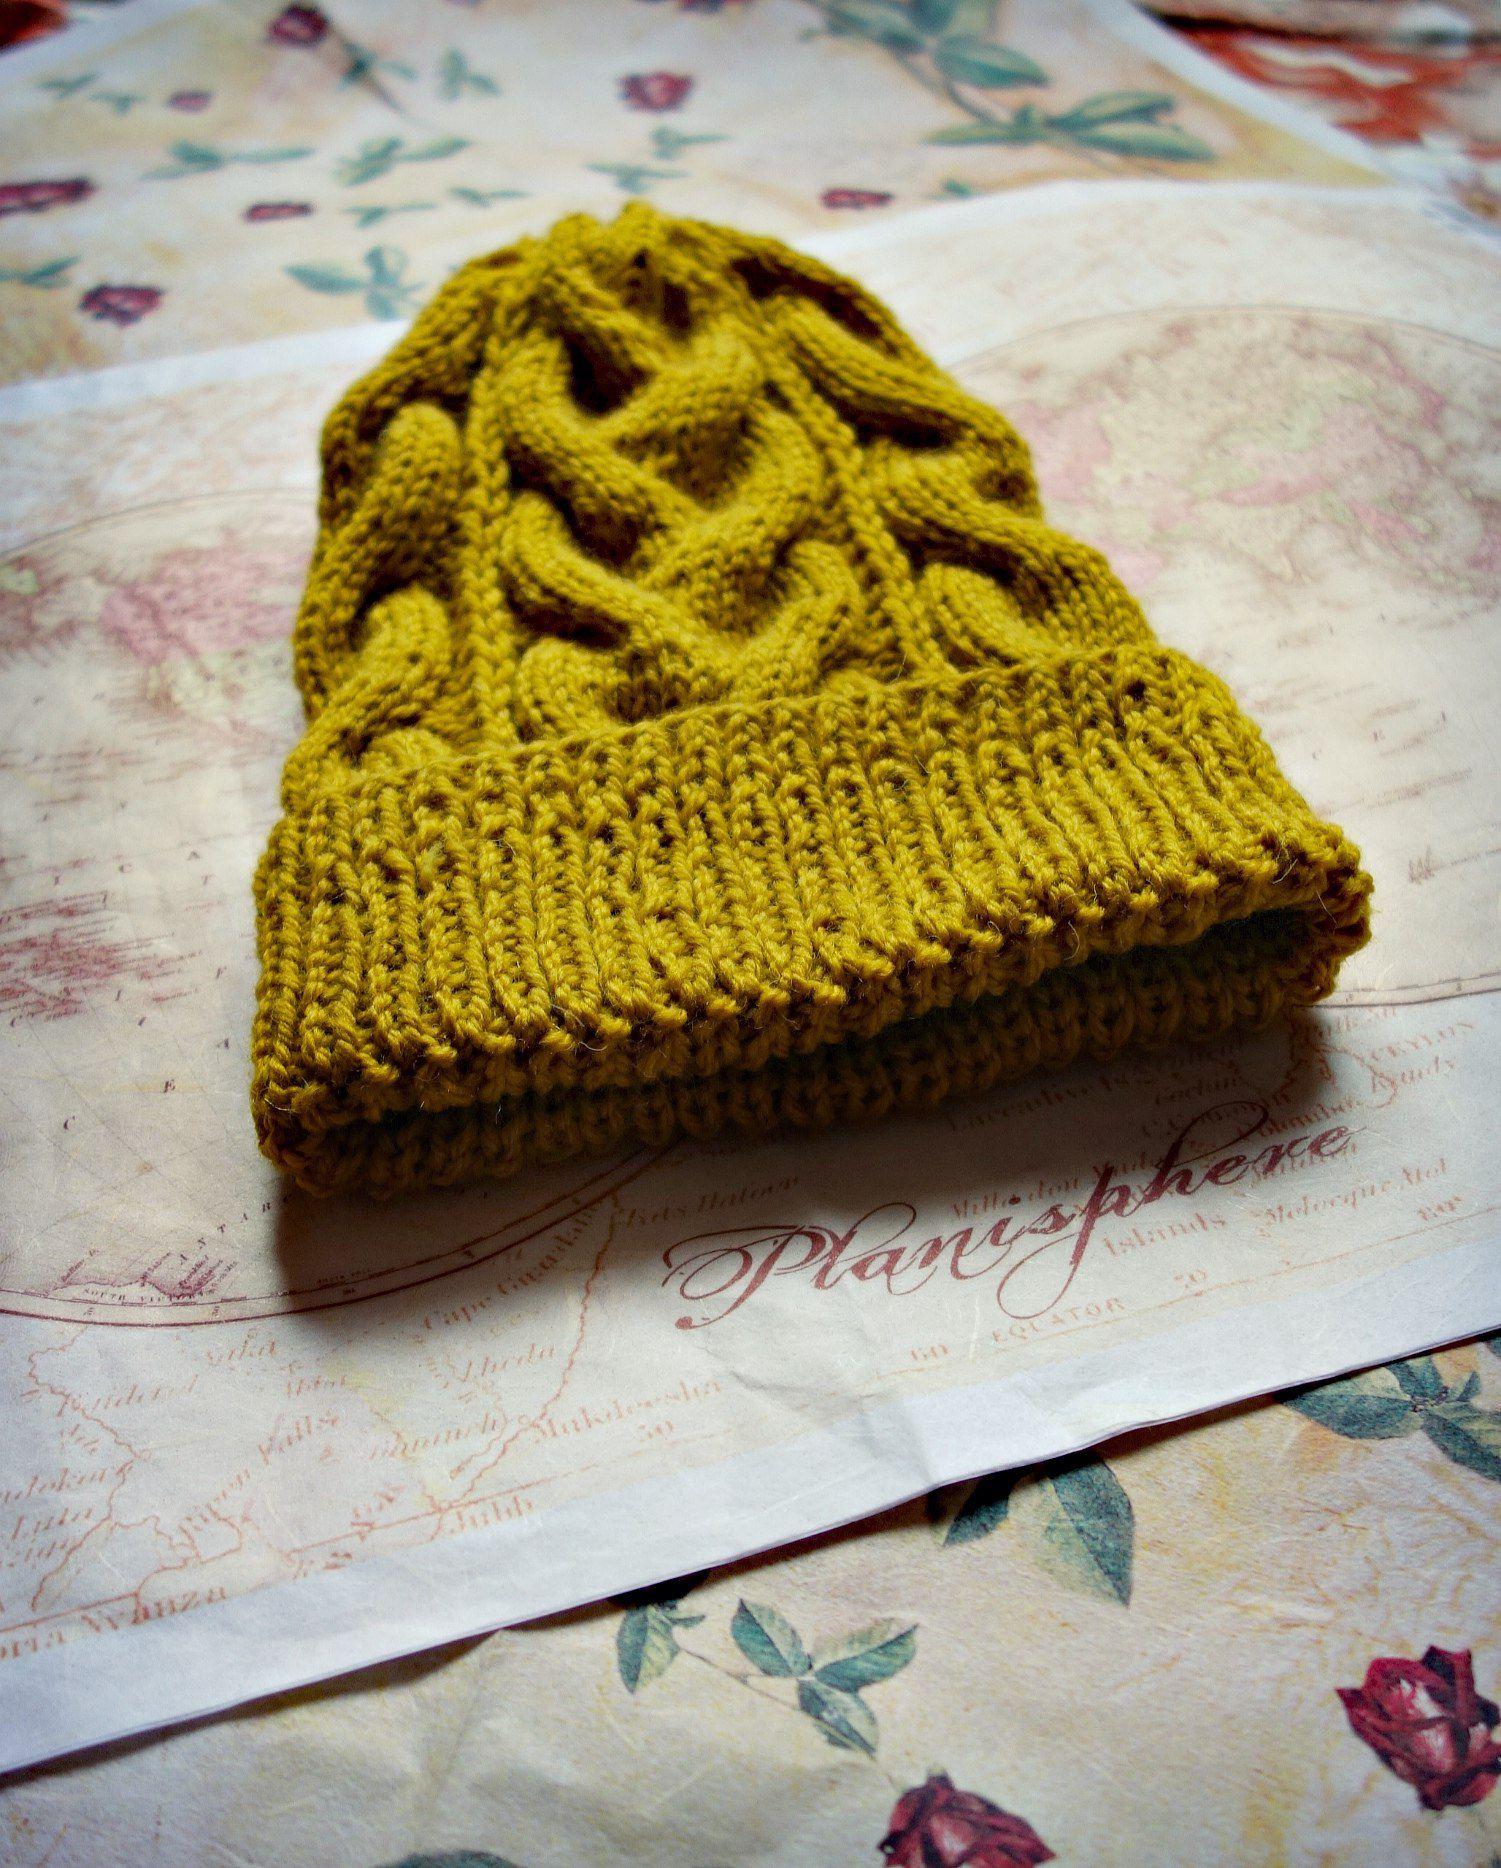 моднаяшапка желтаяшапка аксессуар шапка шапказимняя стиль шапкавязаная шапкаженская шапкаскосами вязание мода ручнаяработа